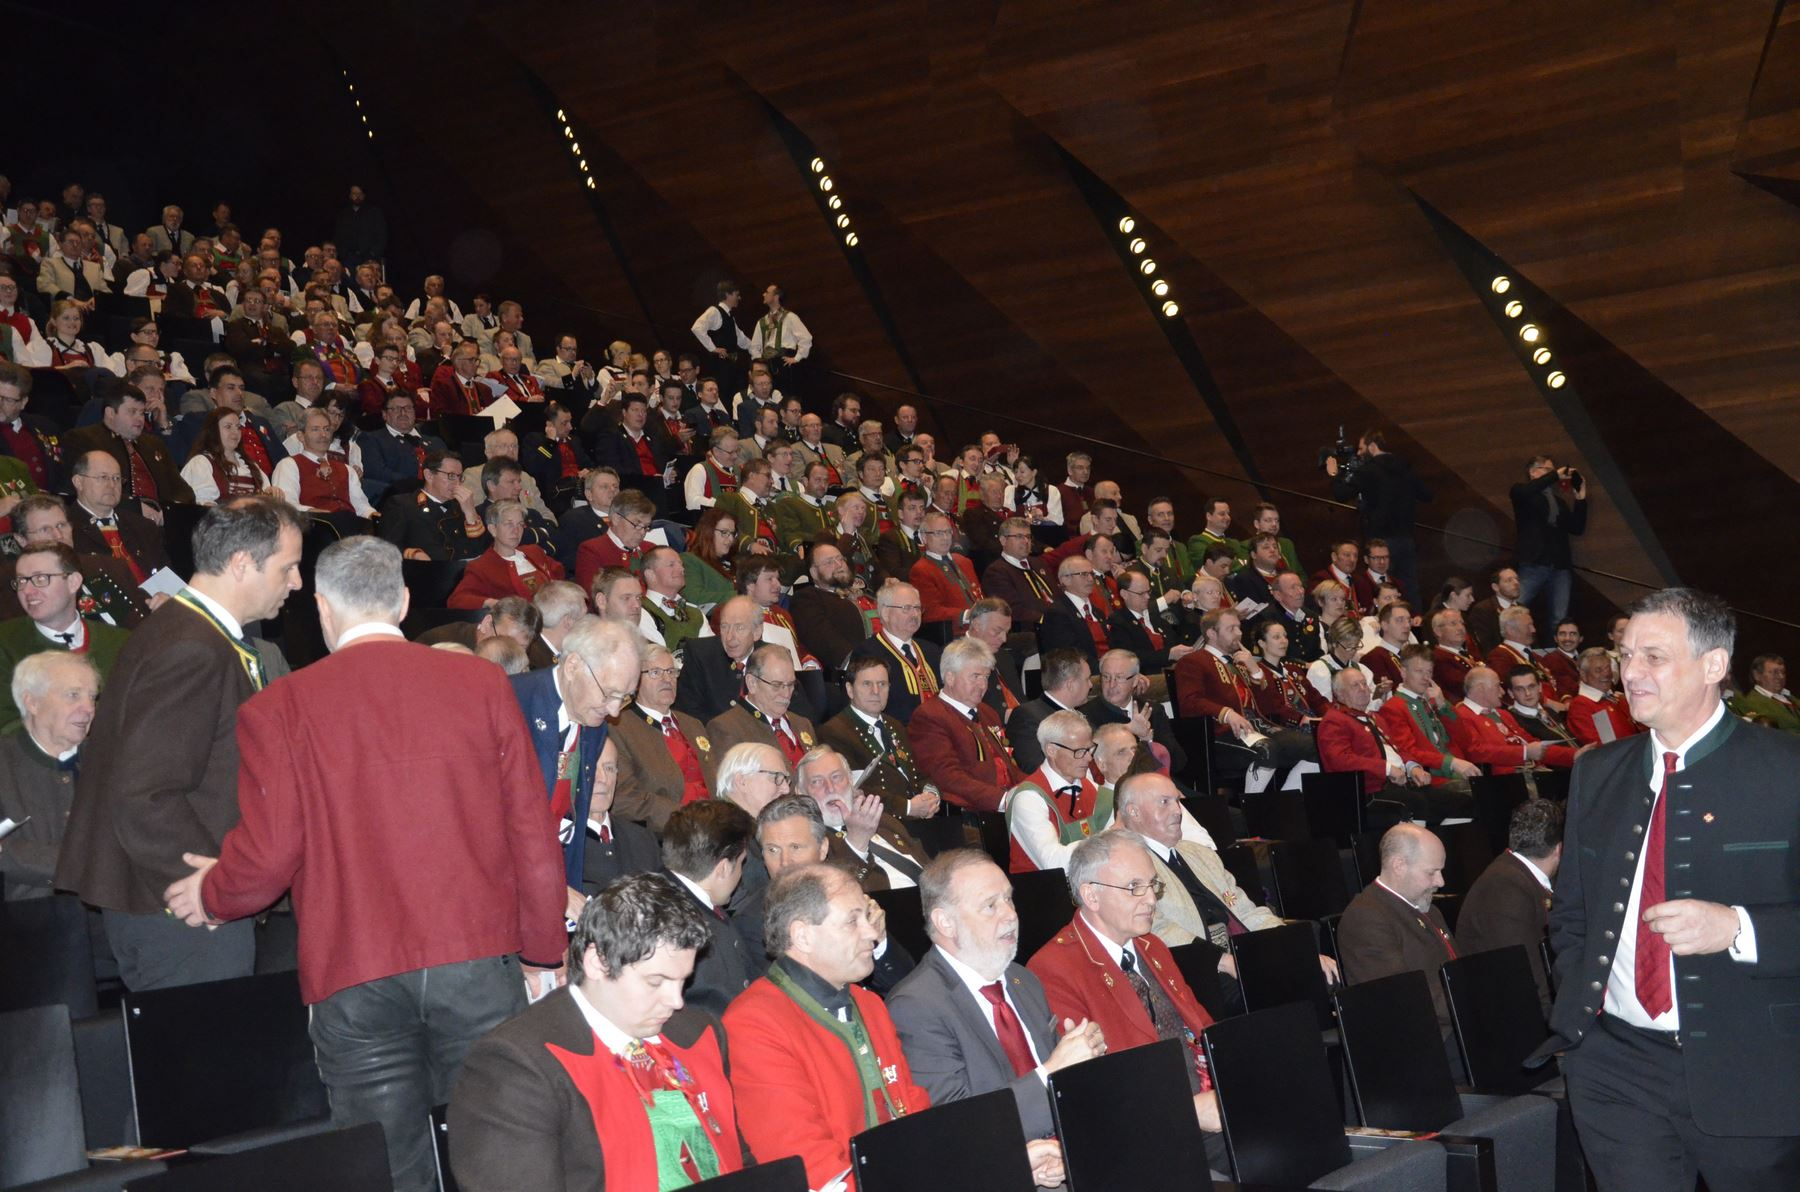 2017-03-12 Landesverbandsitzung Erl 010